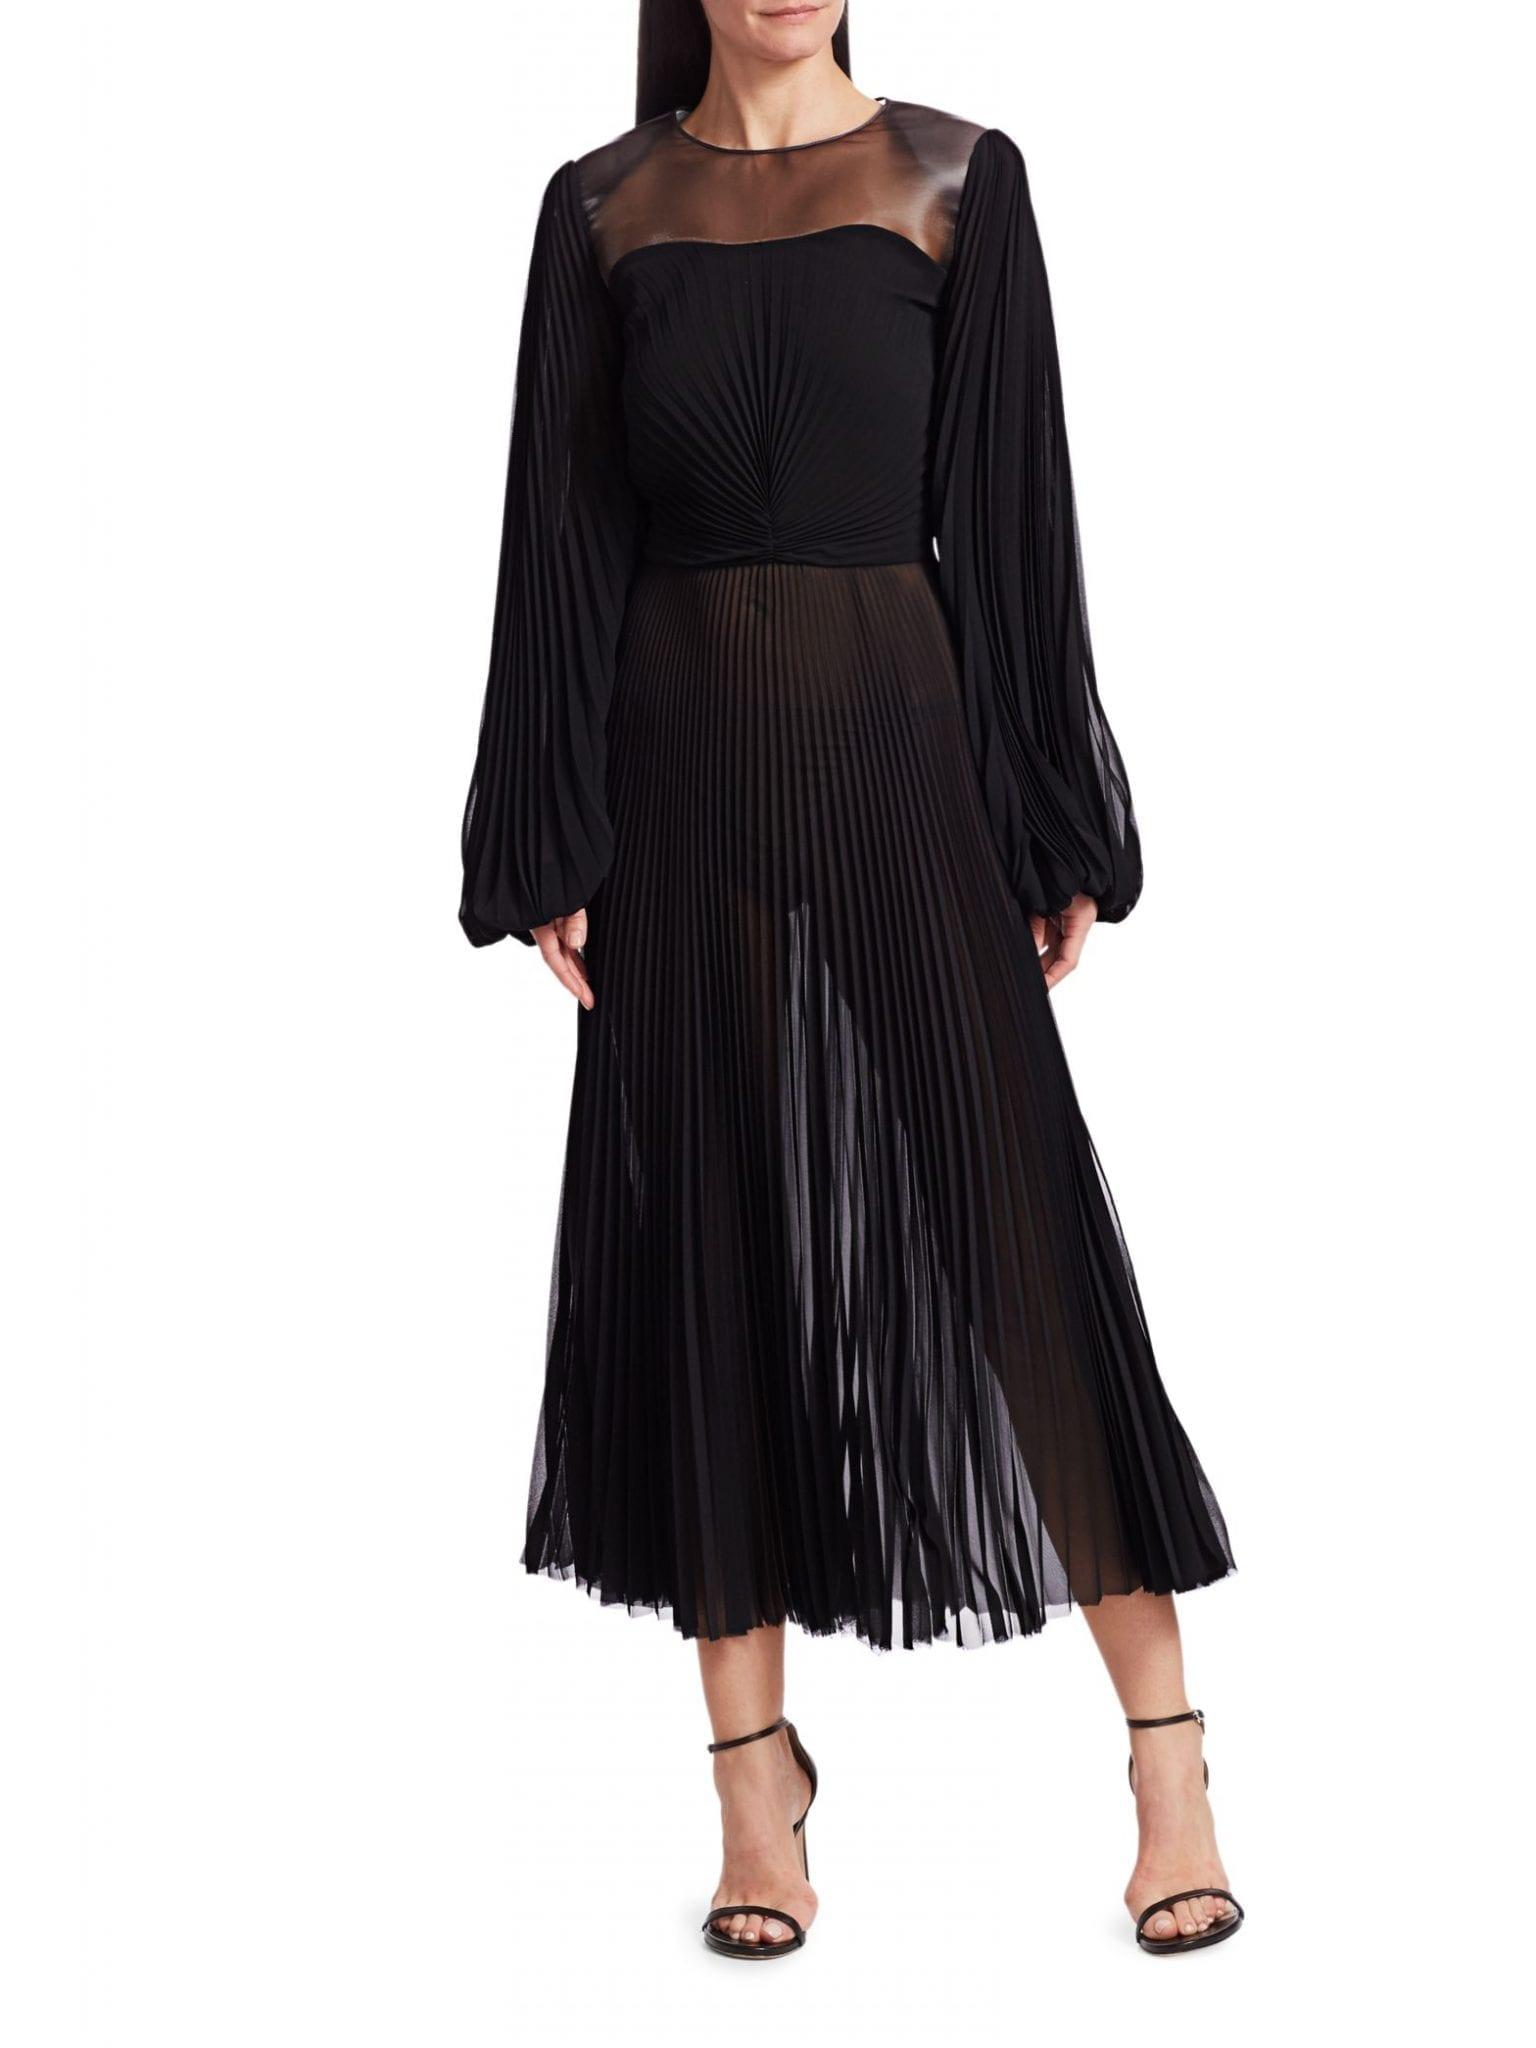 TRE BY NATALIE RATABESI The Howlite Dress